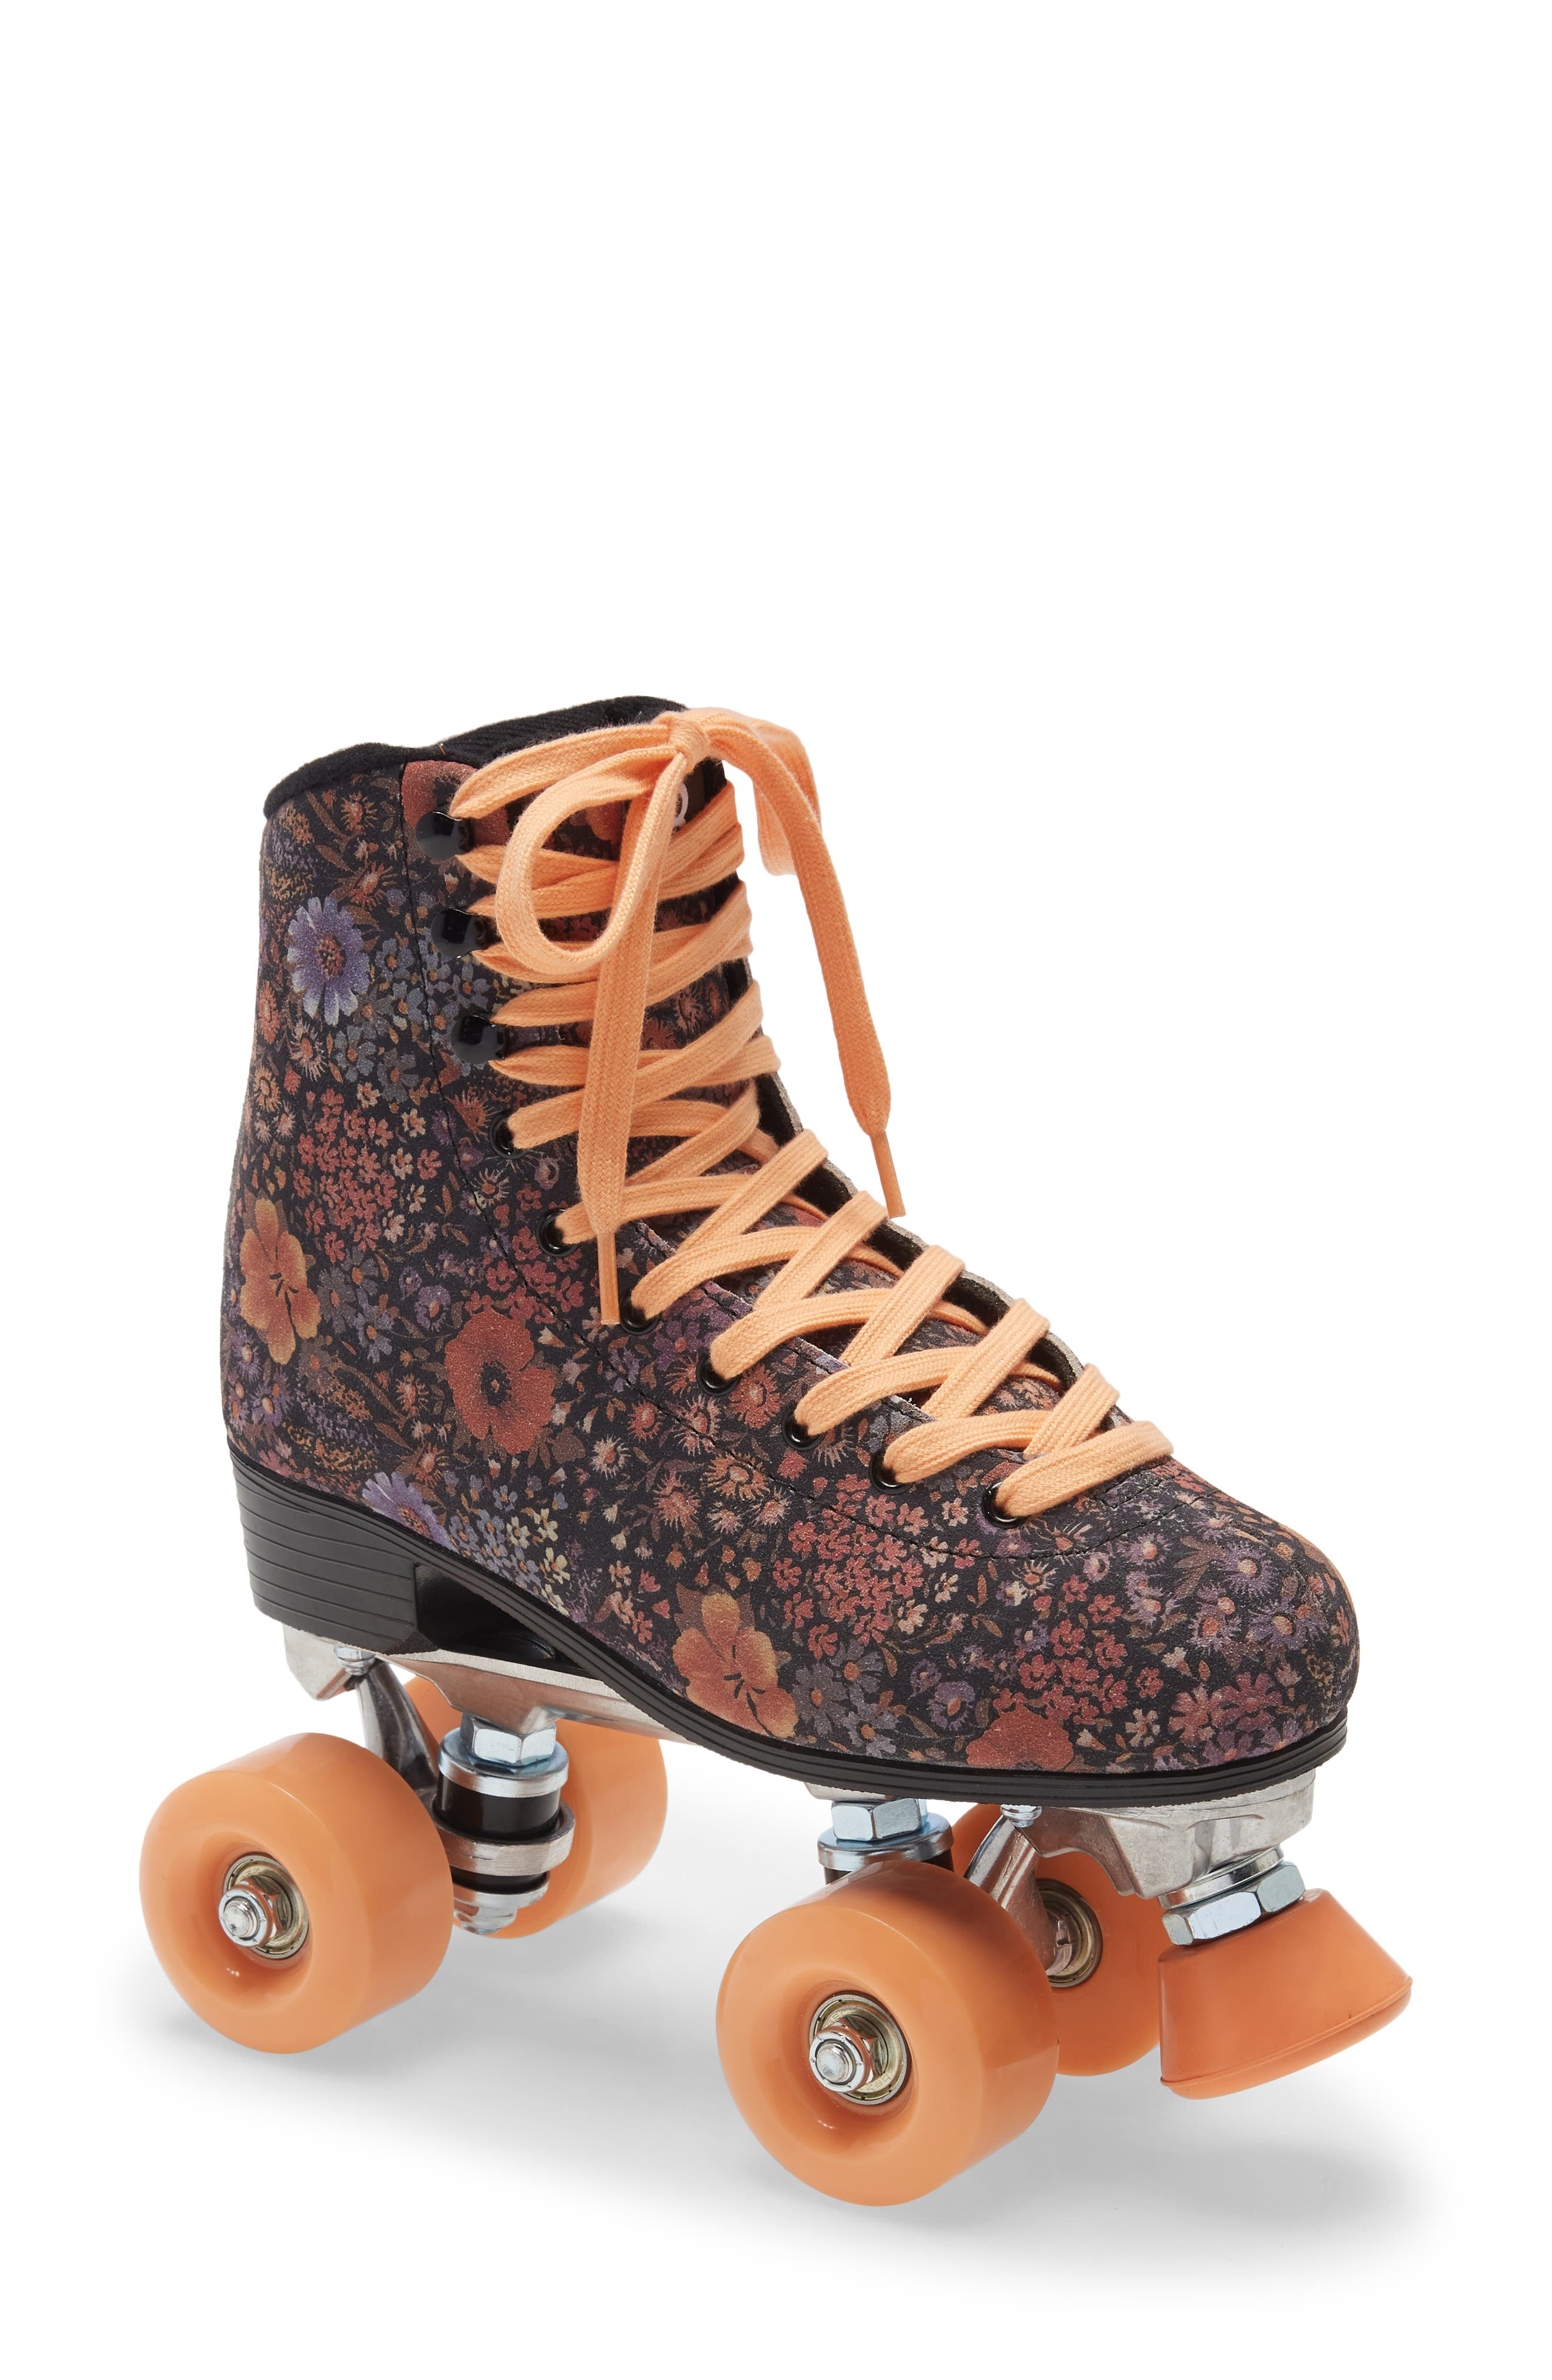 Baby Baby Roller Skates